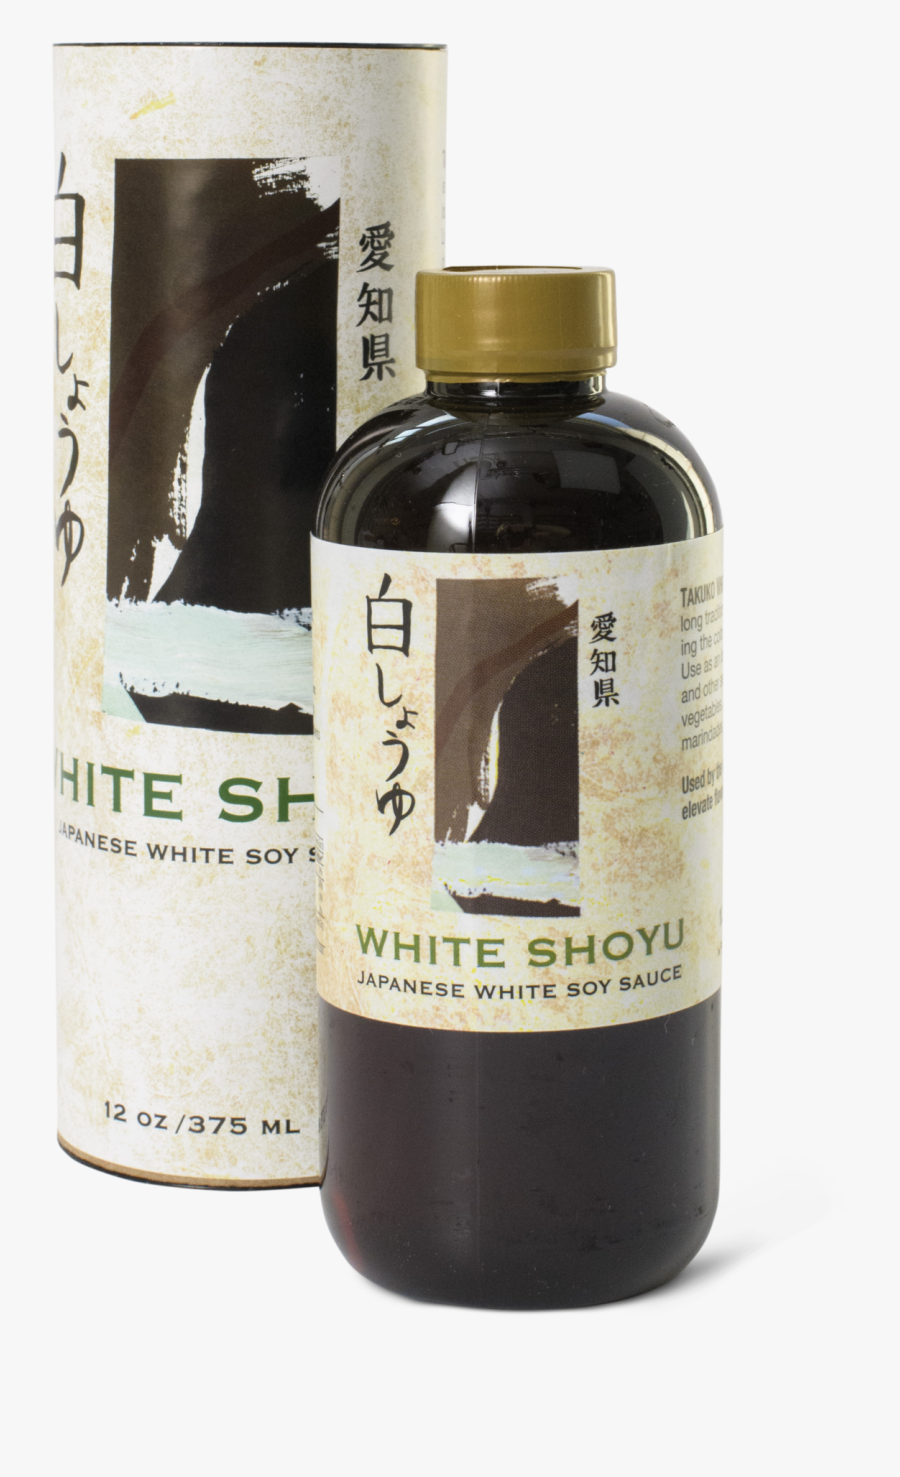 Transparent Soy Sauce Clipart - Takuko White Shoyu Japanese White Soy Sauce 375ml, Transparent Clipart